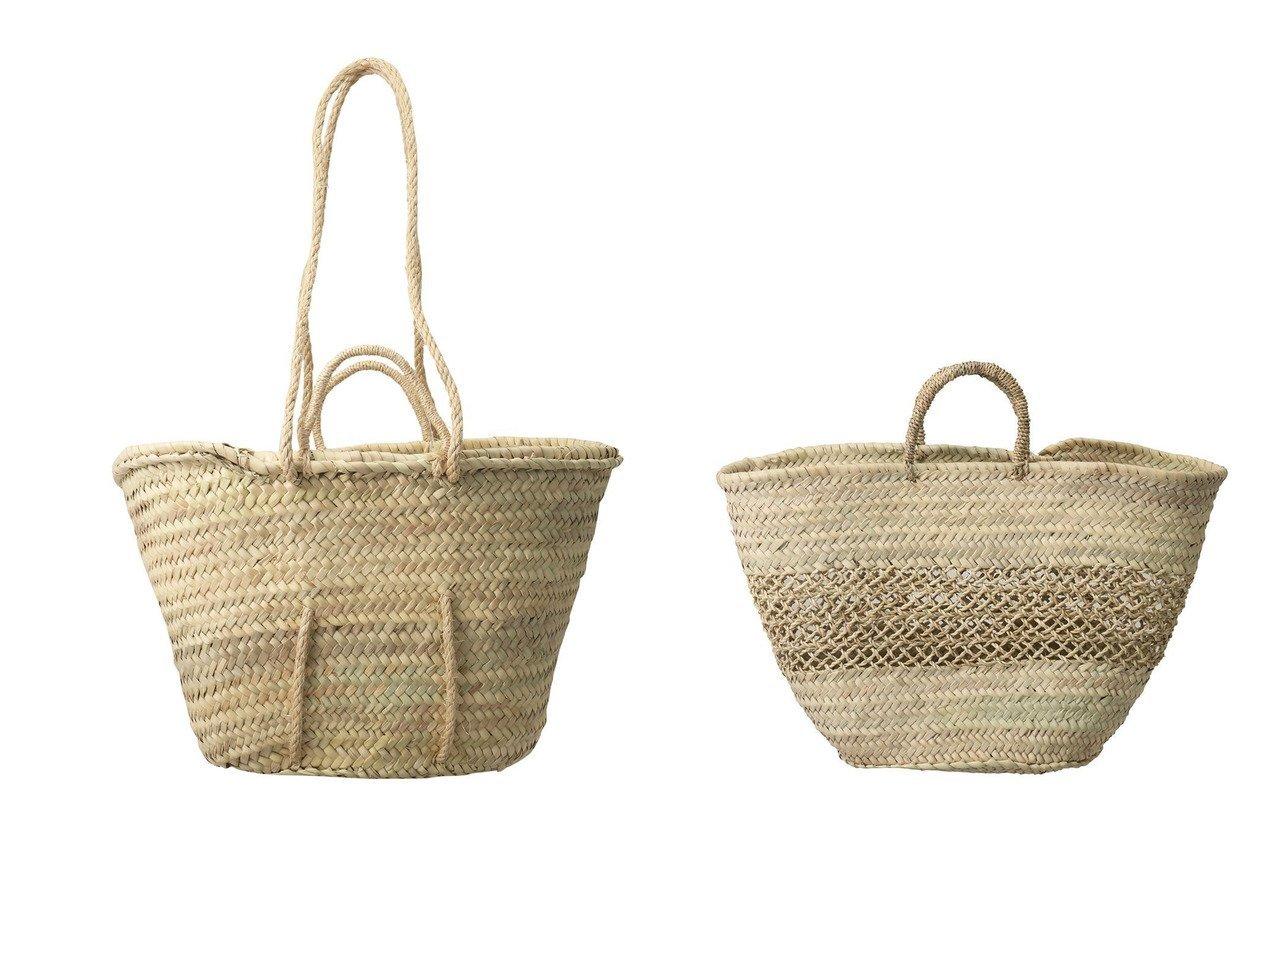 【1er Arrondissement/プルミエ アロンディスモン】の【KECH】カゴバッグ&【KECH】カゴバッグ 【バッグ・鞄】おすすめ!人気、トレンド・レディースファッションの通販 おすすめで人気の流行・トレンド、ファッションの通販商品 インテリア・家具・メンズファッション・キッズファッション・レディースファッション・服の通販 founy(ファニー) https://founy.com/ ファッション Fashion レディースファッション WOMEN バッグ Bag S/S・春夏 SS・Spring/Summer アウトドア ラップ 夏 Summer 春 Spring |ID:crp329100000049429